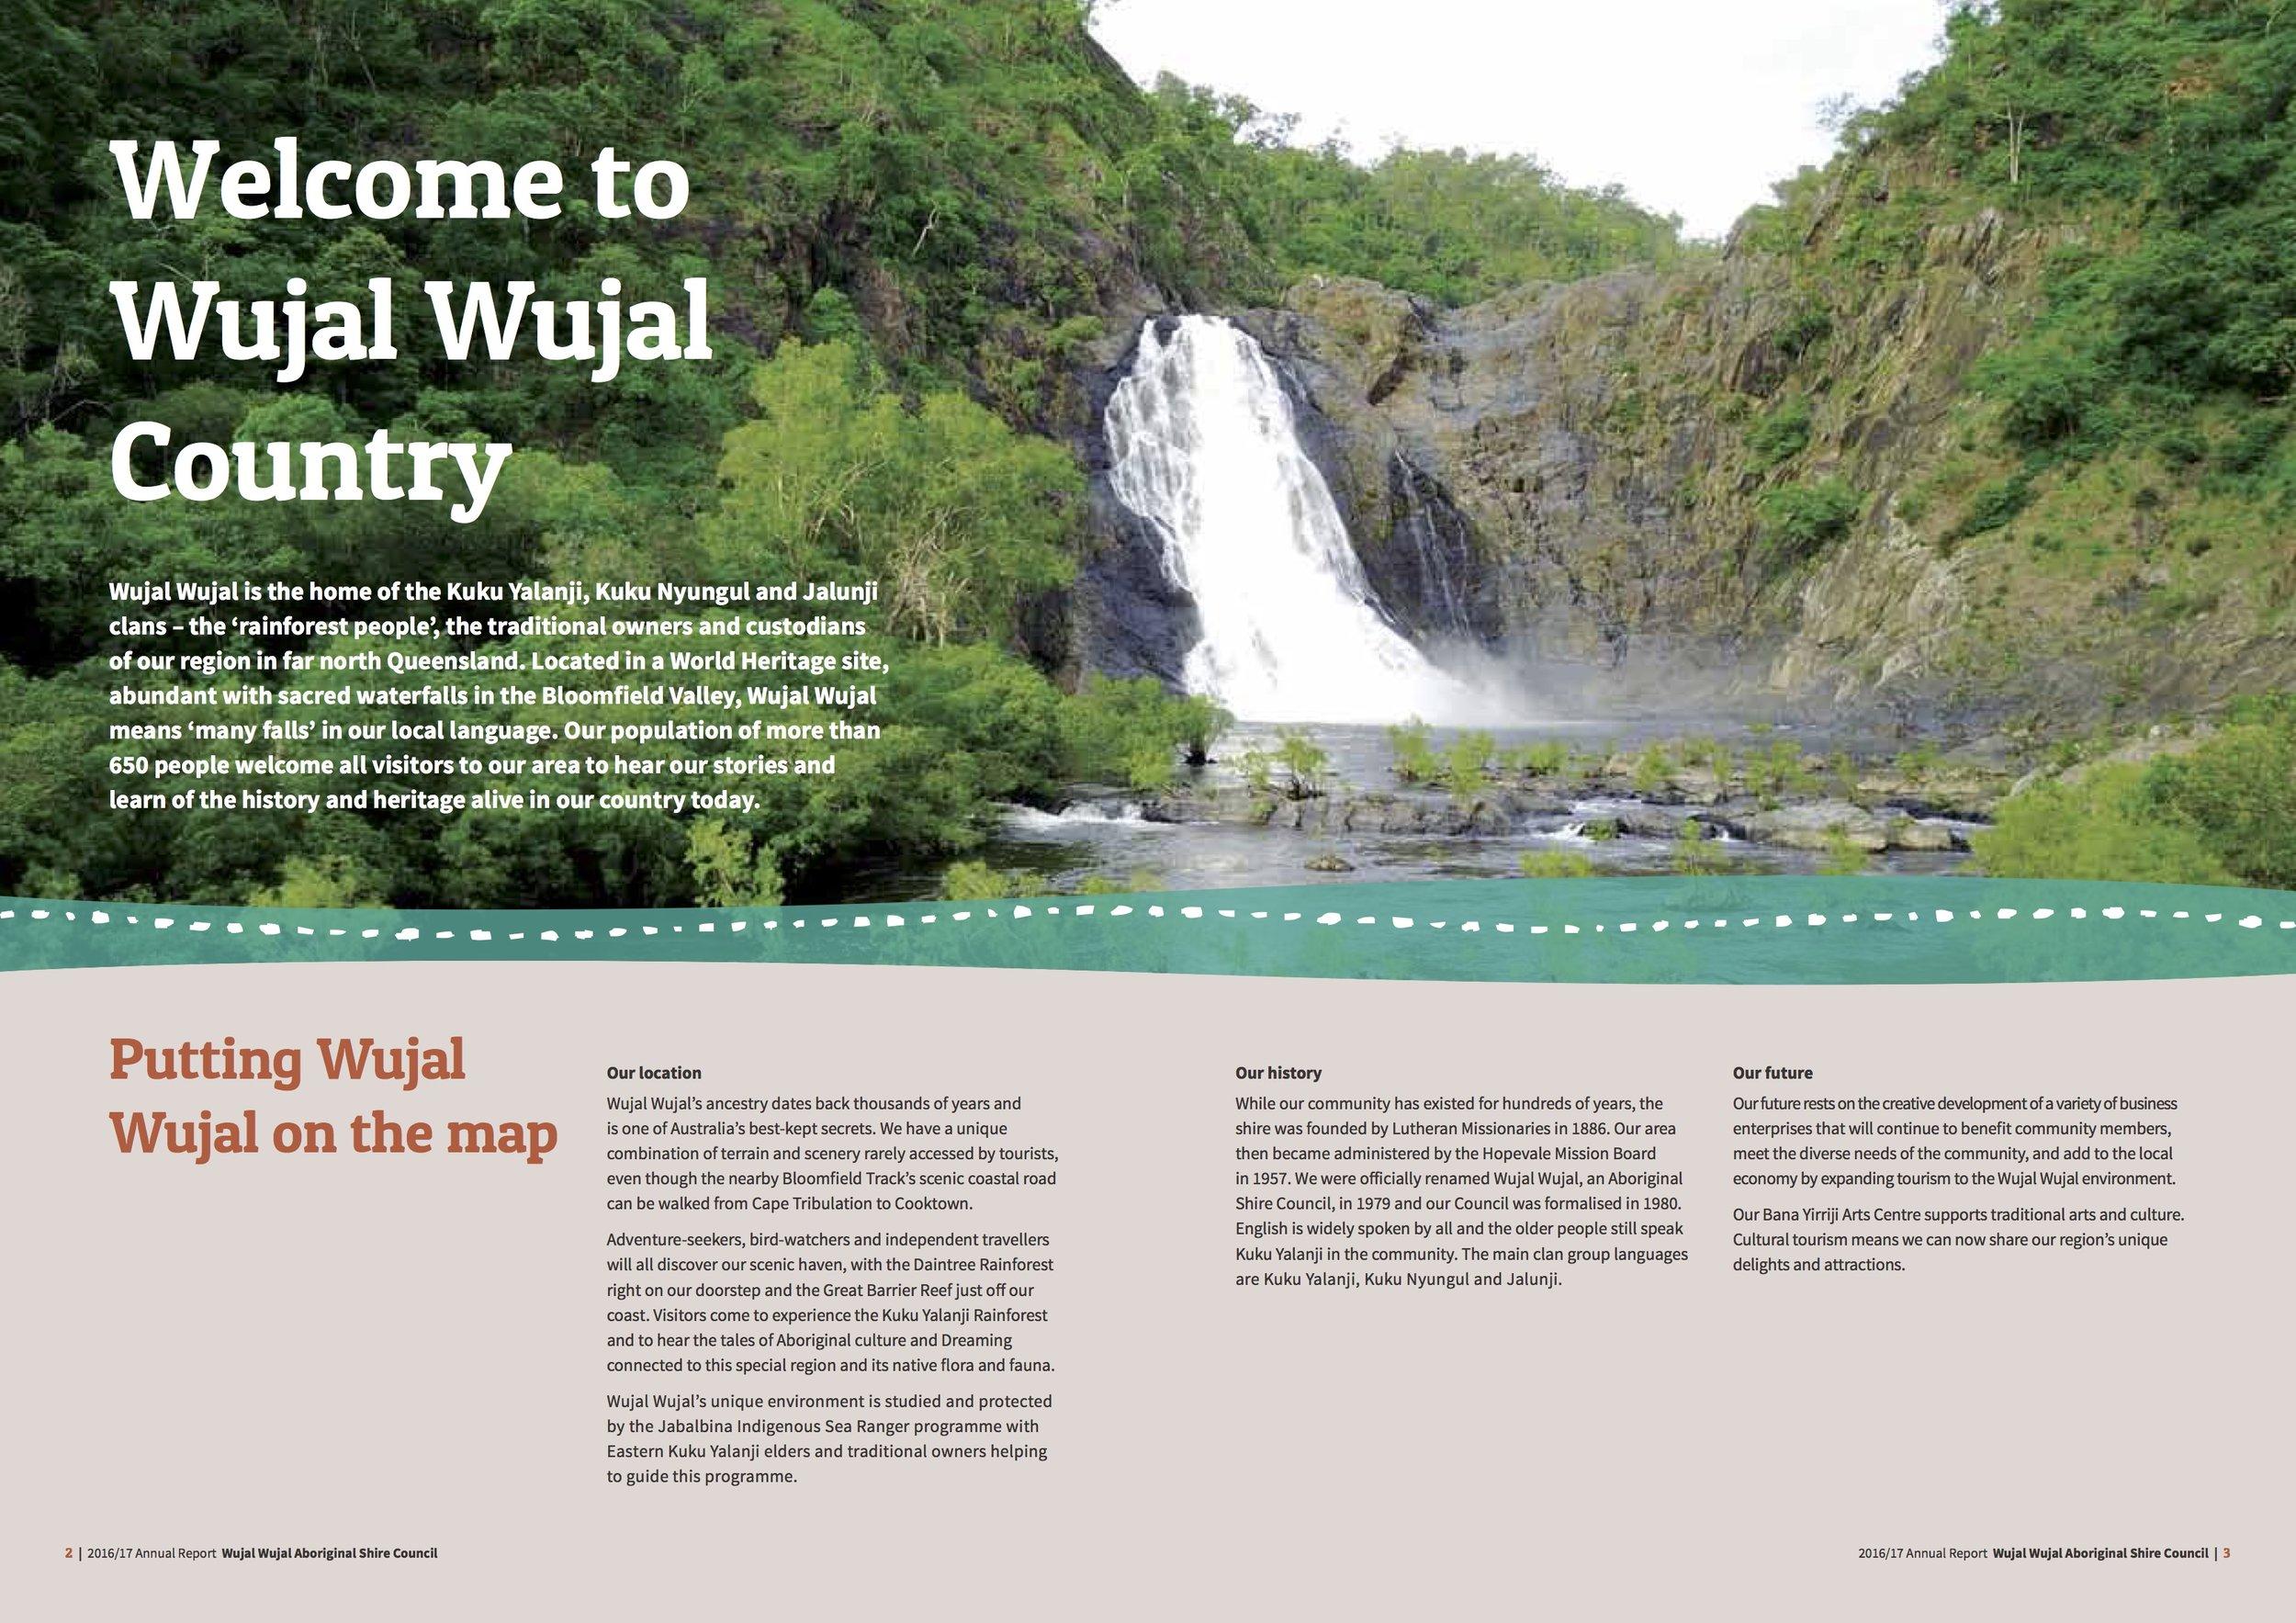 0848 WujalWujal-AnnualReport-FINAL-0848 WujalWujal-AnnualReport-spreads_1.jpg